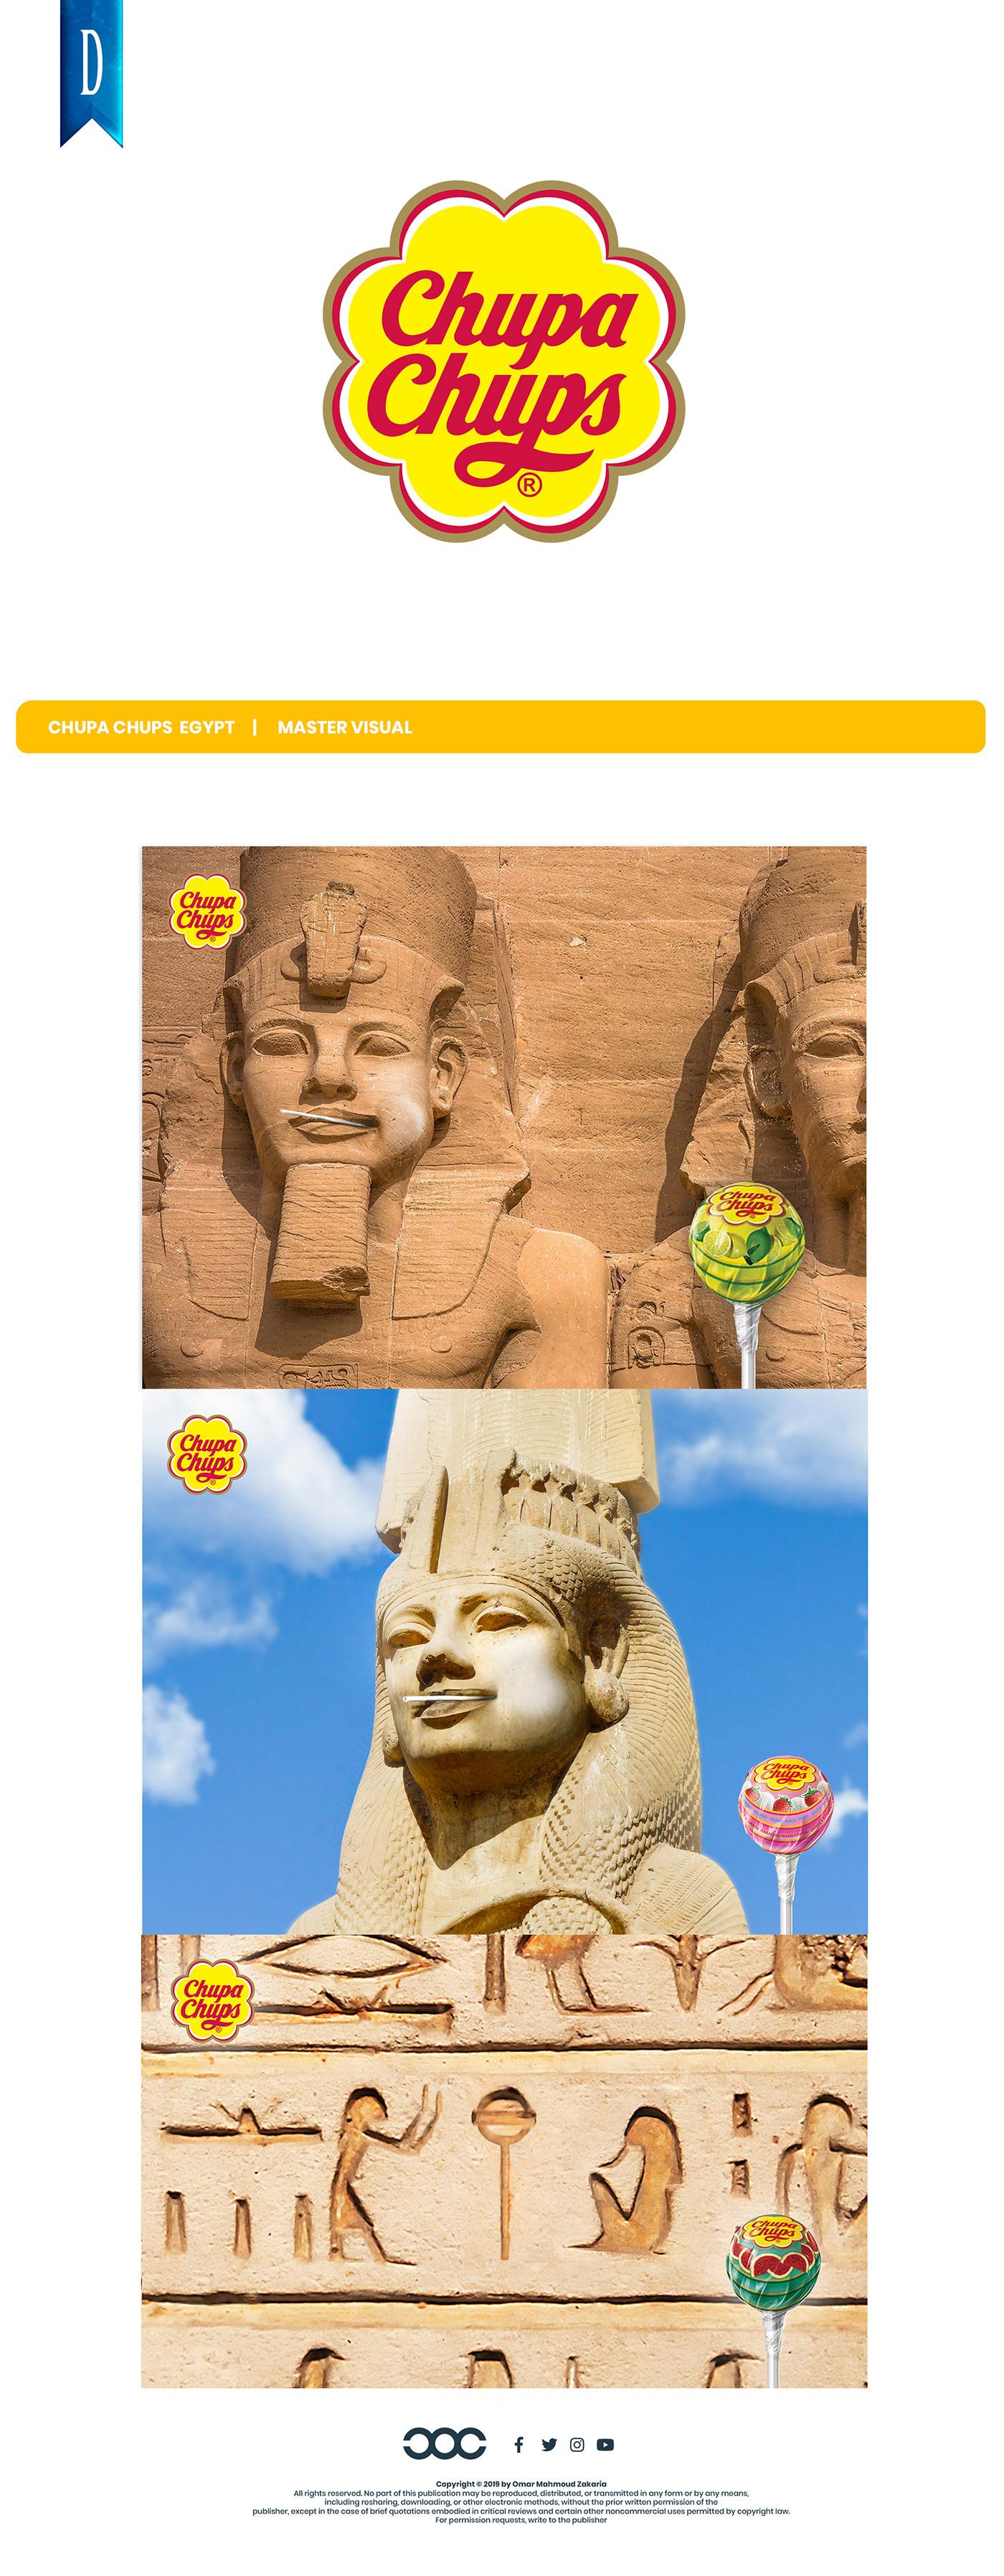 chupa chups lollipop egypt luxor aswan history creative design Love social media